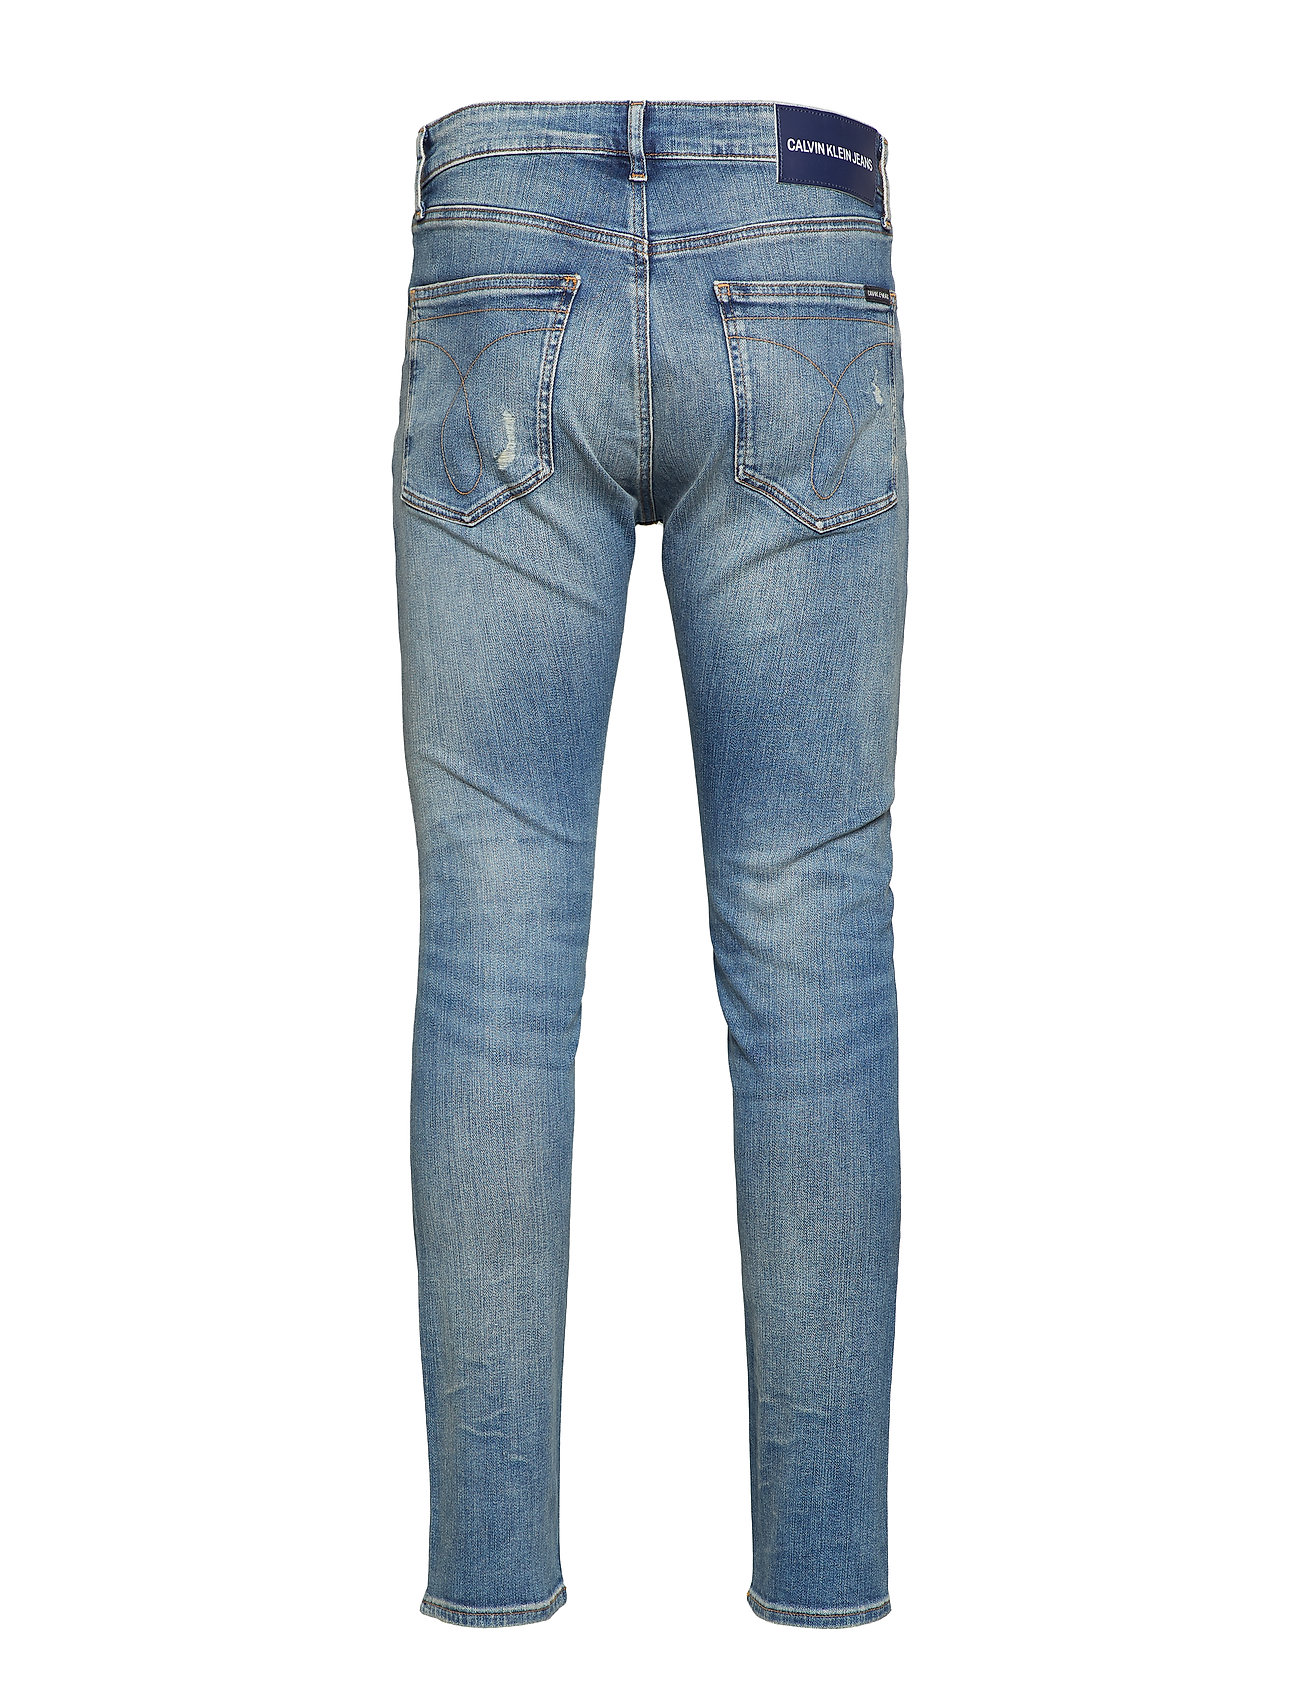 016 Ckj Jeans Klein BlueCalvin Skinnygeorge qUpVSMz